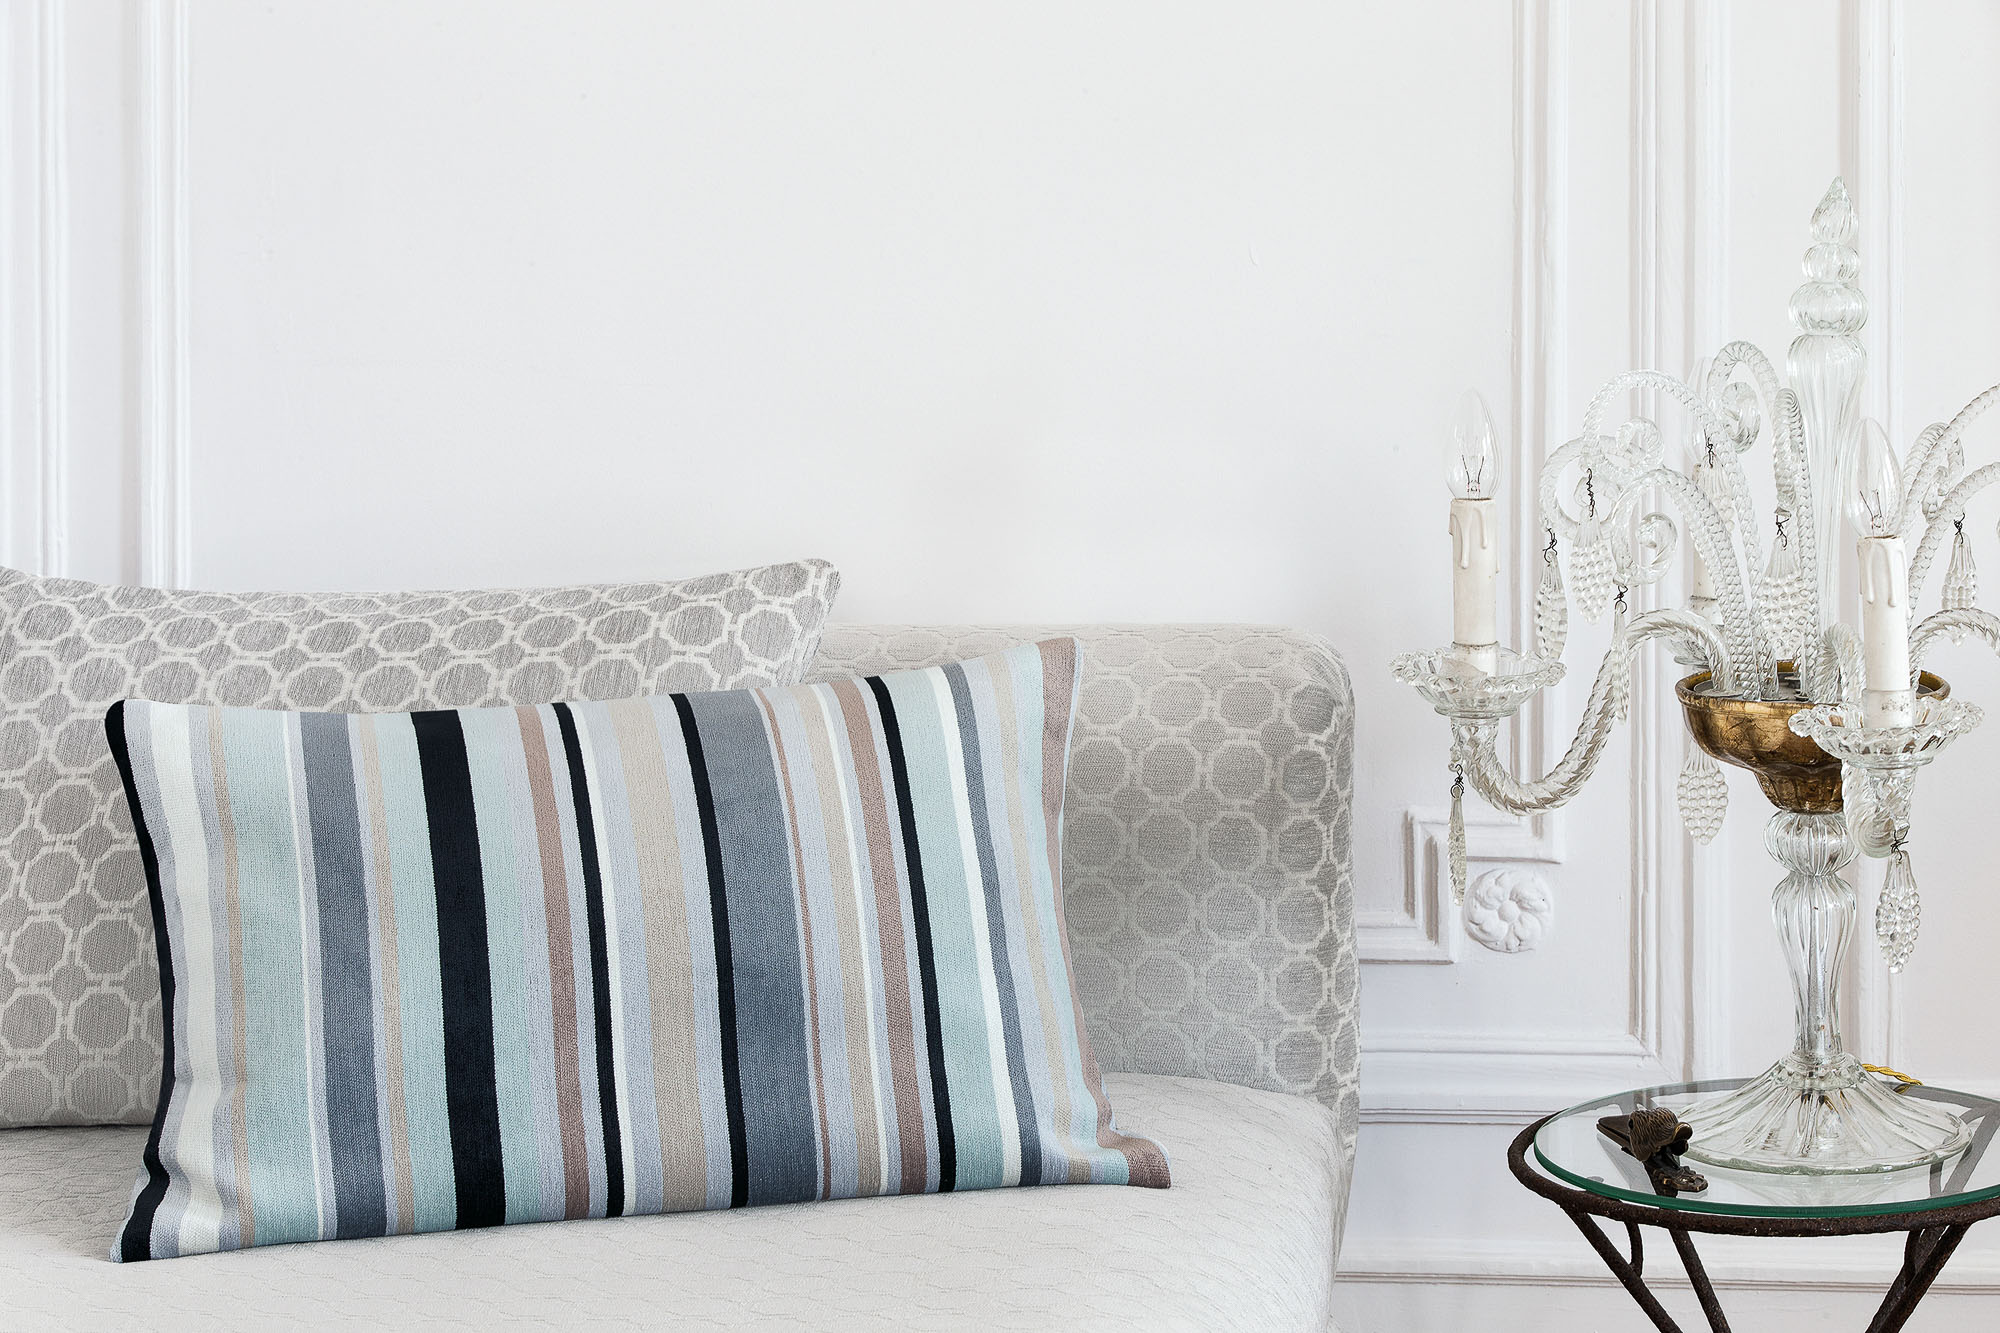 FROne_inherently_flameretardant_textile_fabrics_testing_standards_frone (1)